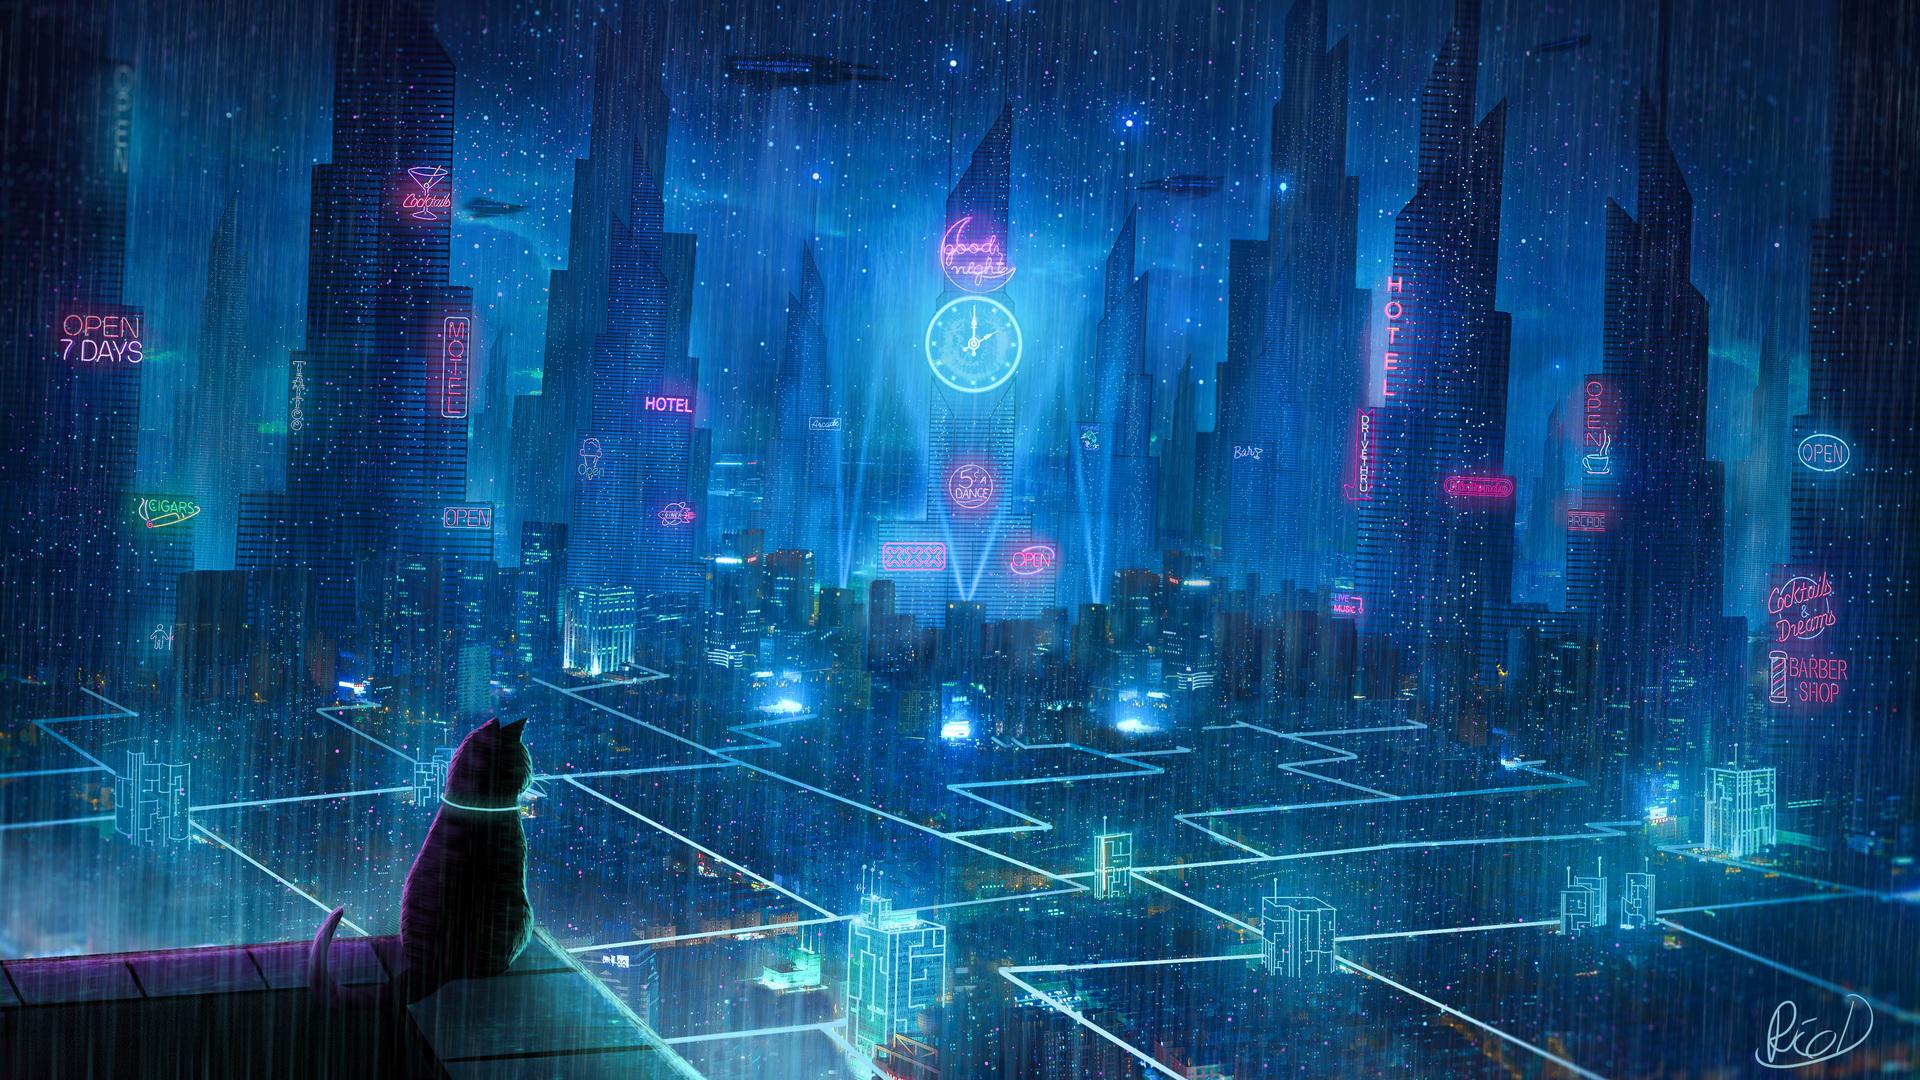 1920x1080 Cat Rain Dream Cyberpunk City 4k Laptop Full HD ...